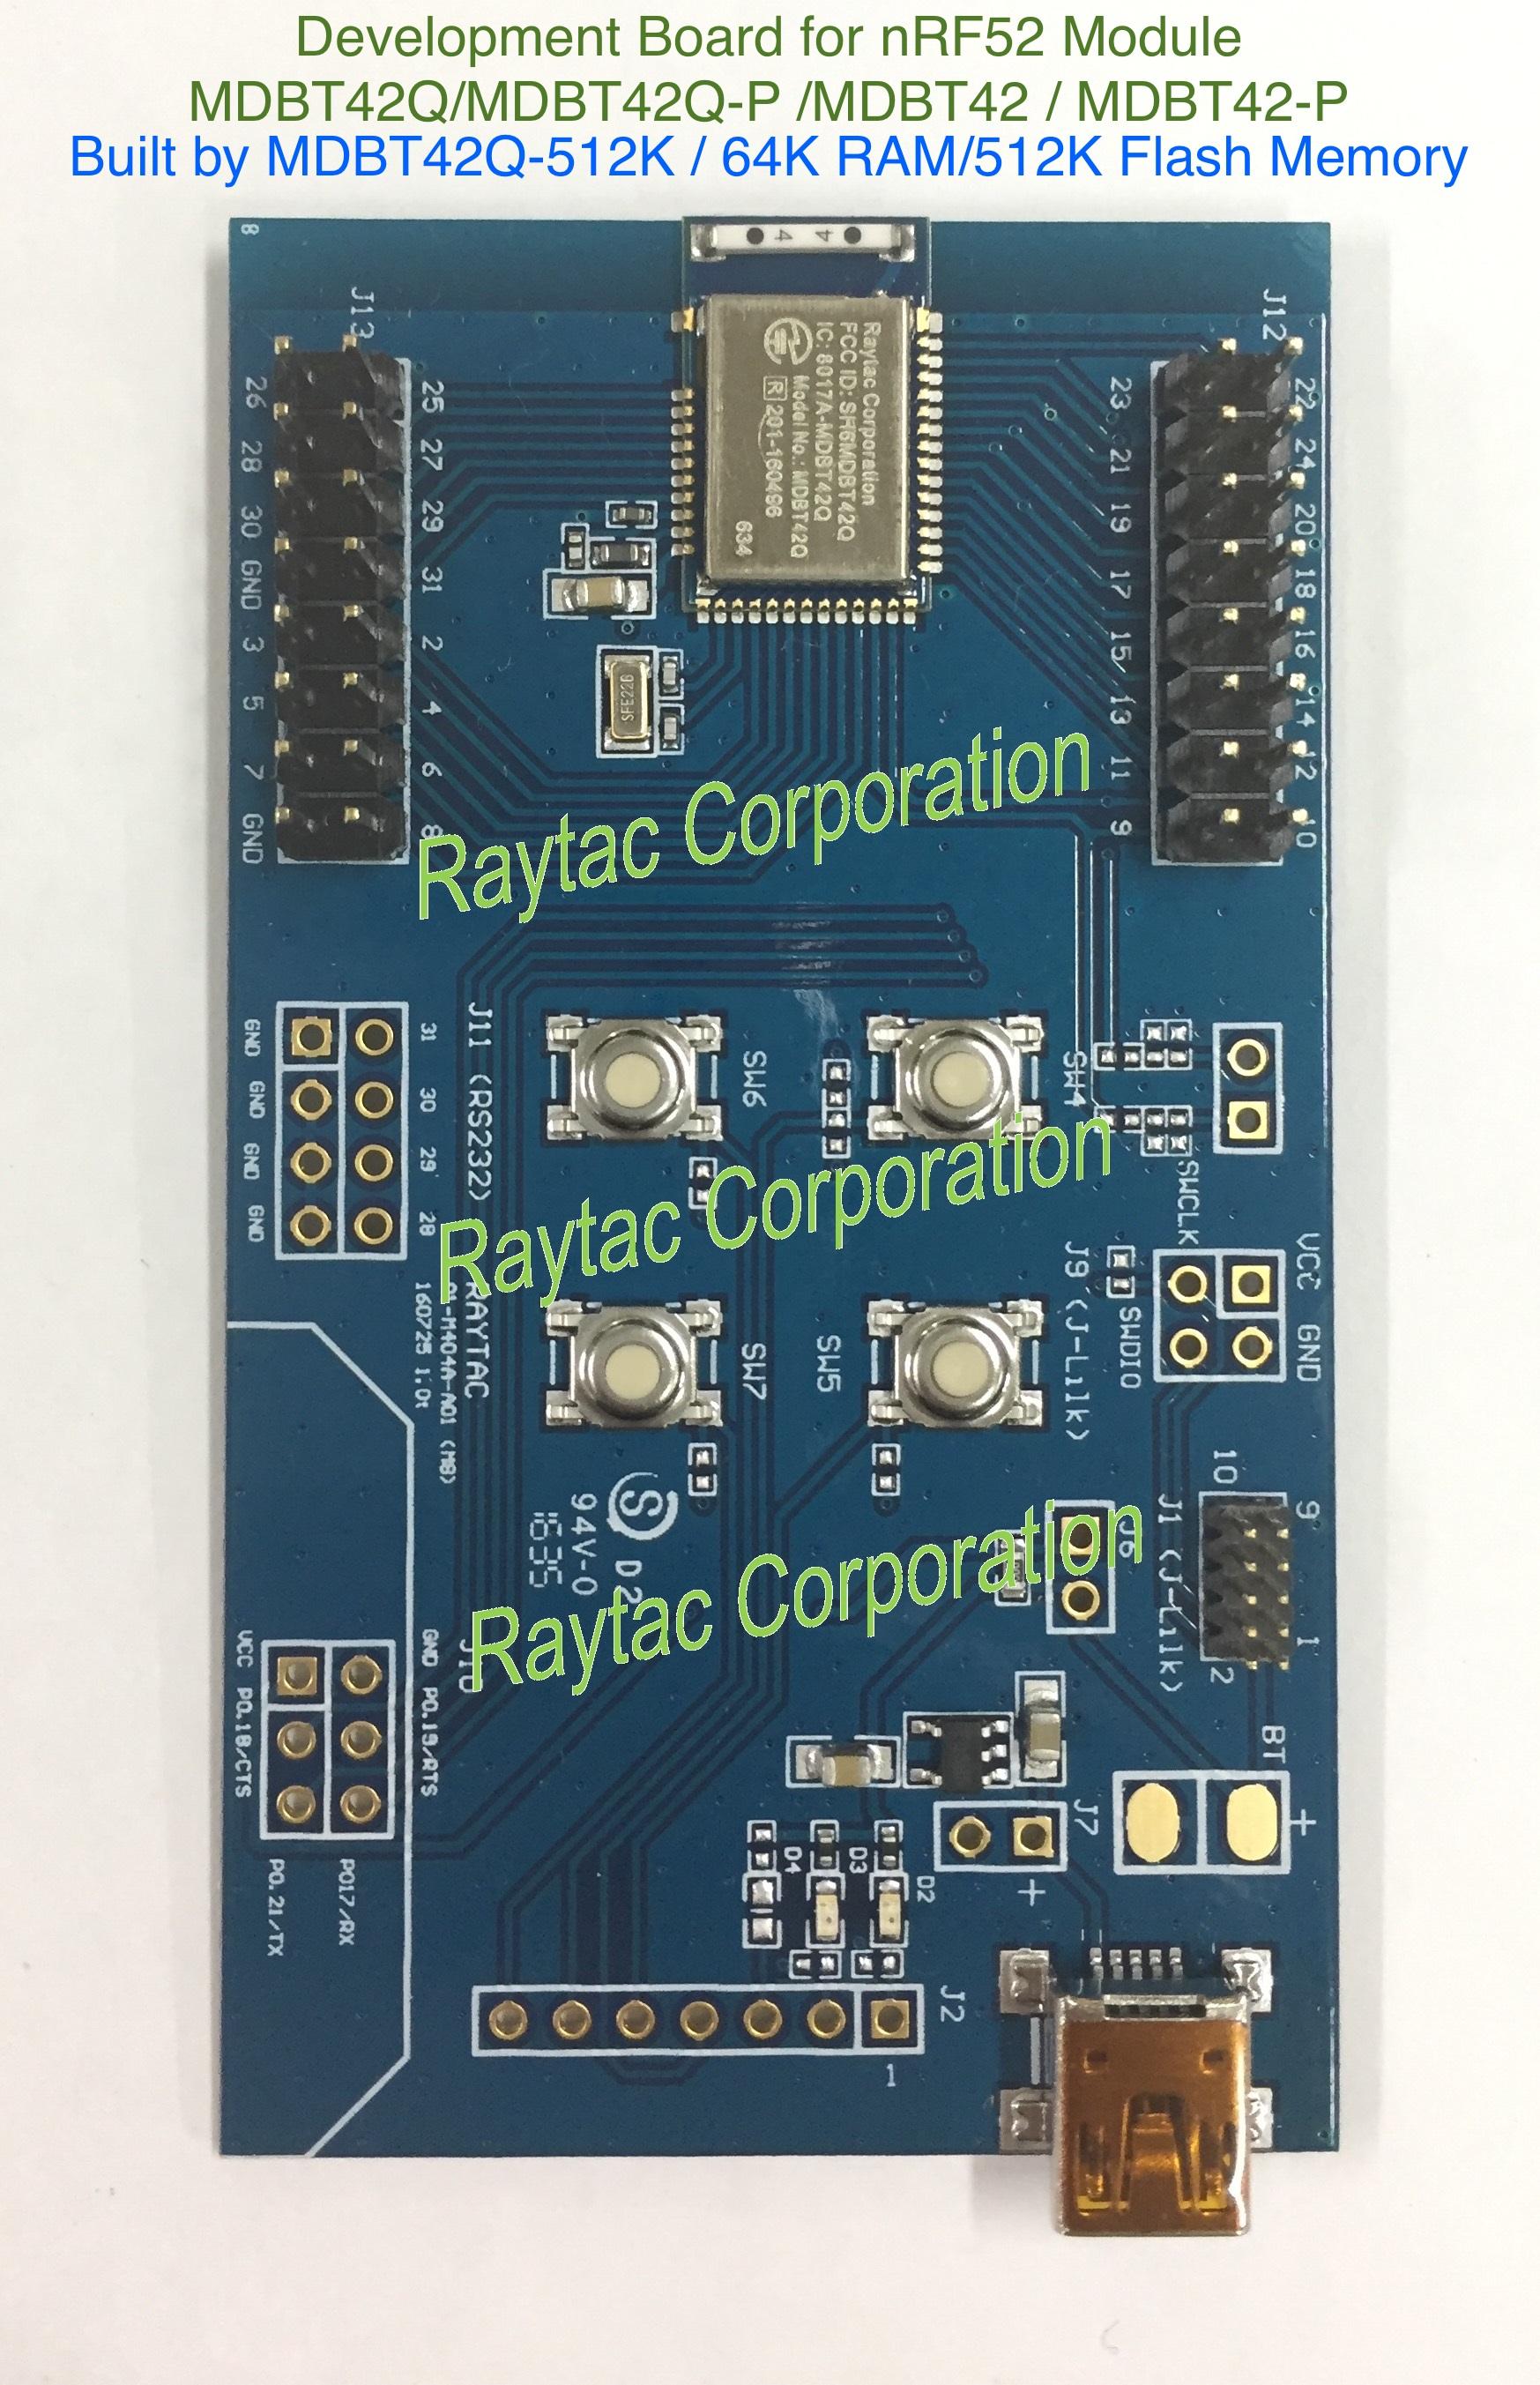 Raytac — How to use Raytac MDBT42Q (Nordic nRF52832) Demo